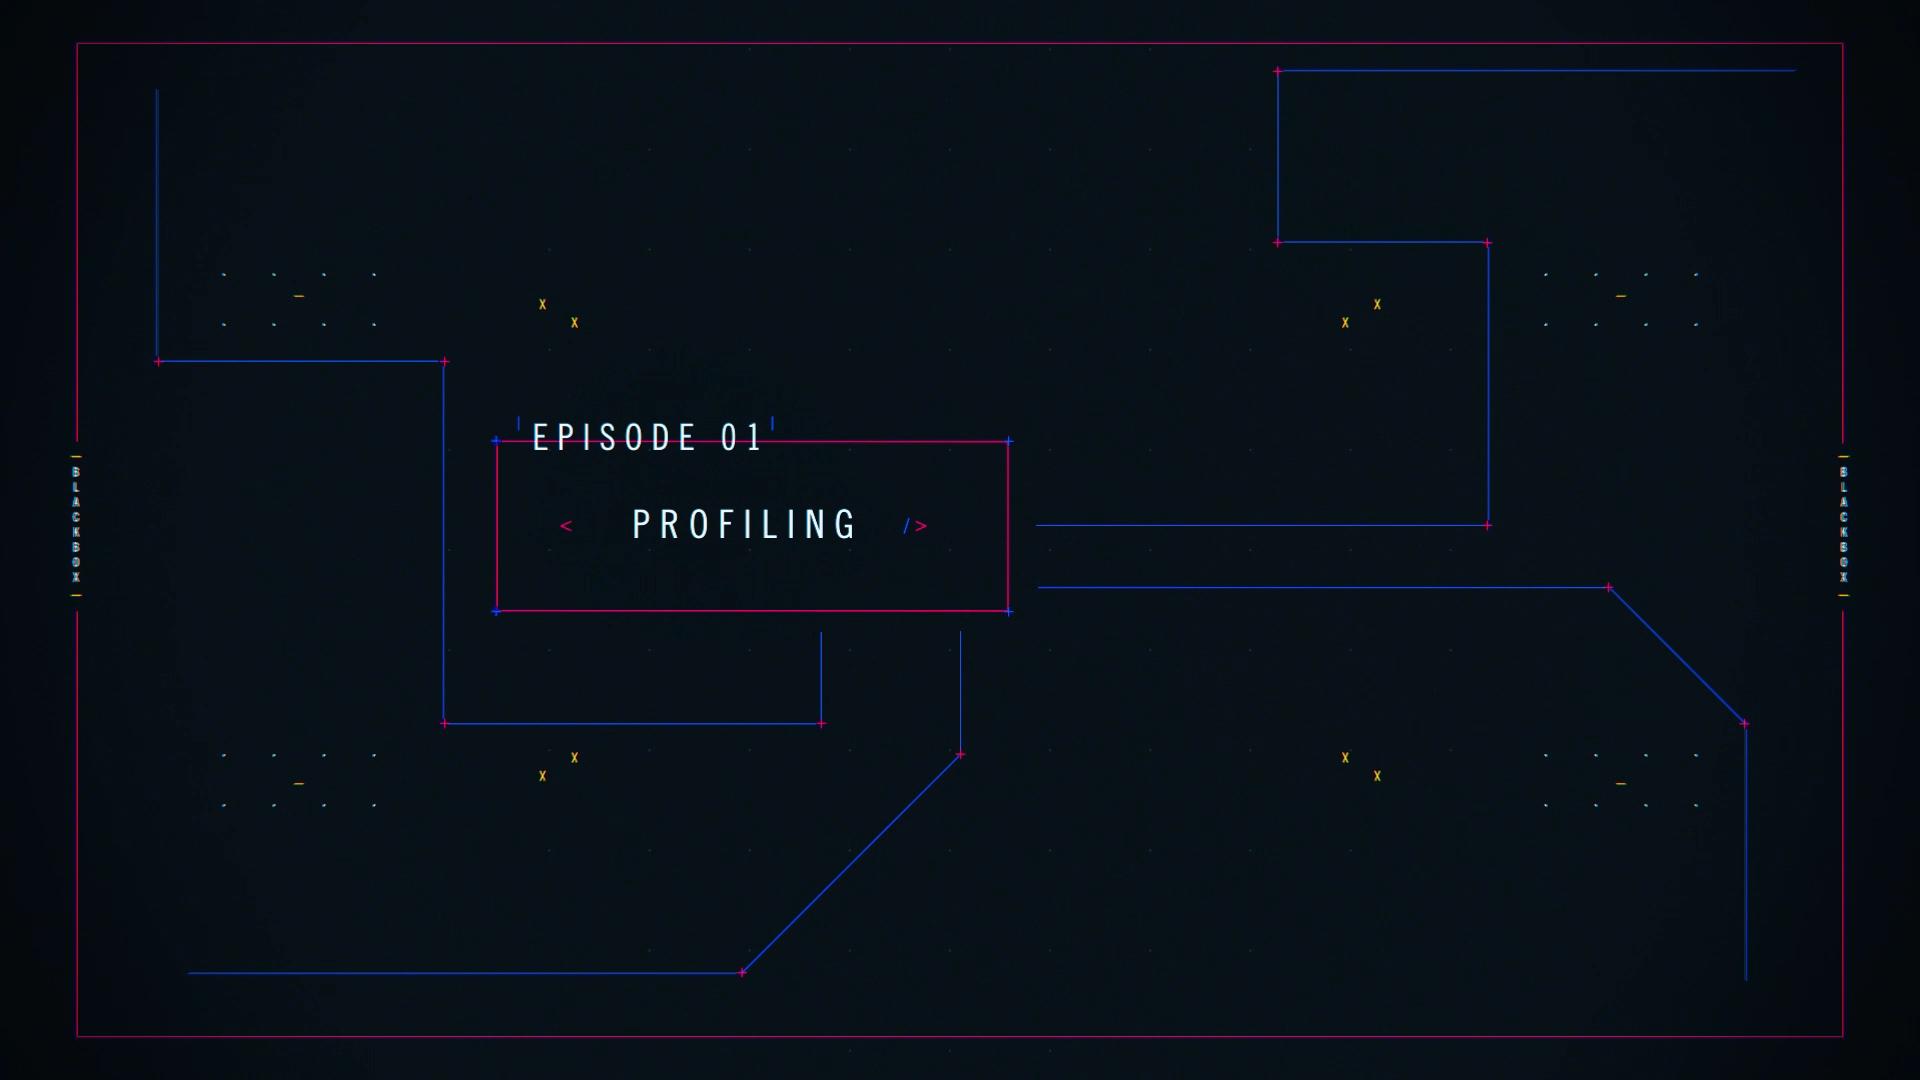 ProPublica_BlackBox_Data_Episode_1 FINAL_092216_00583.png